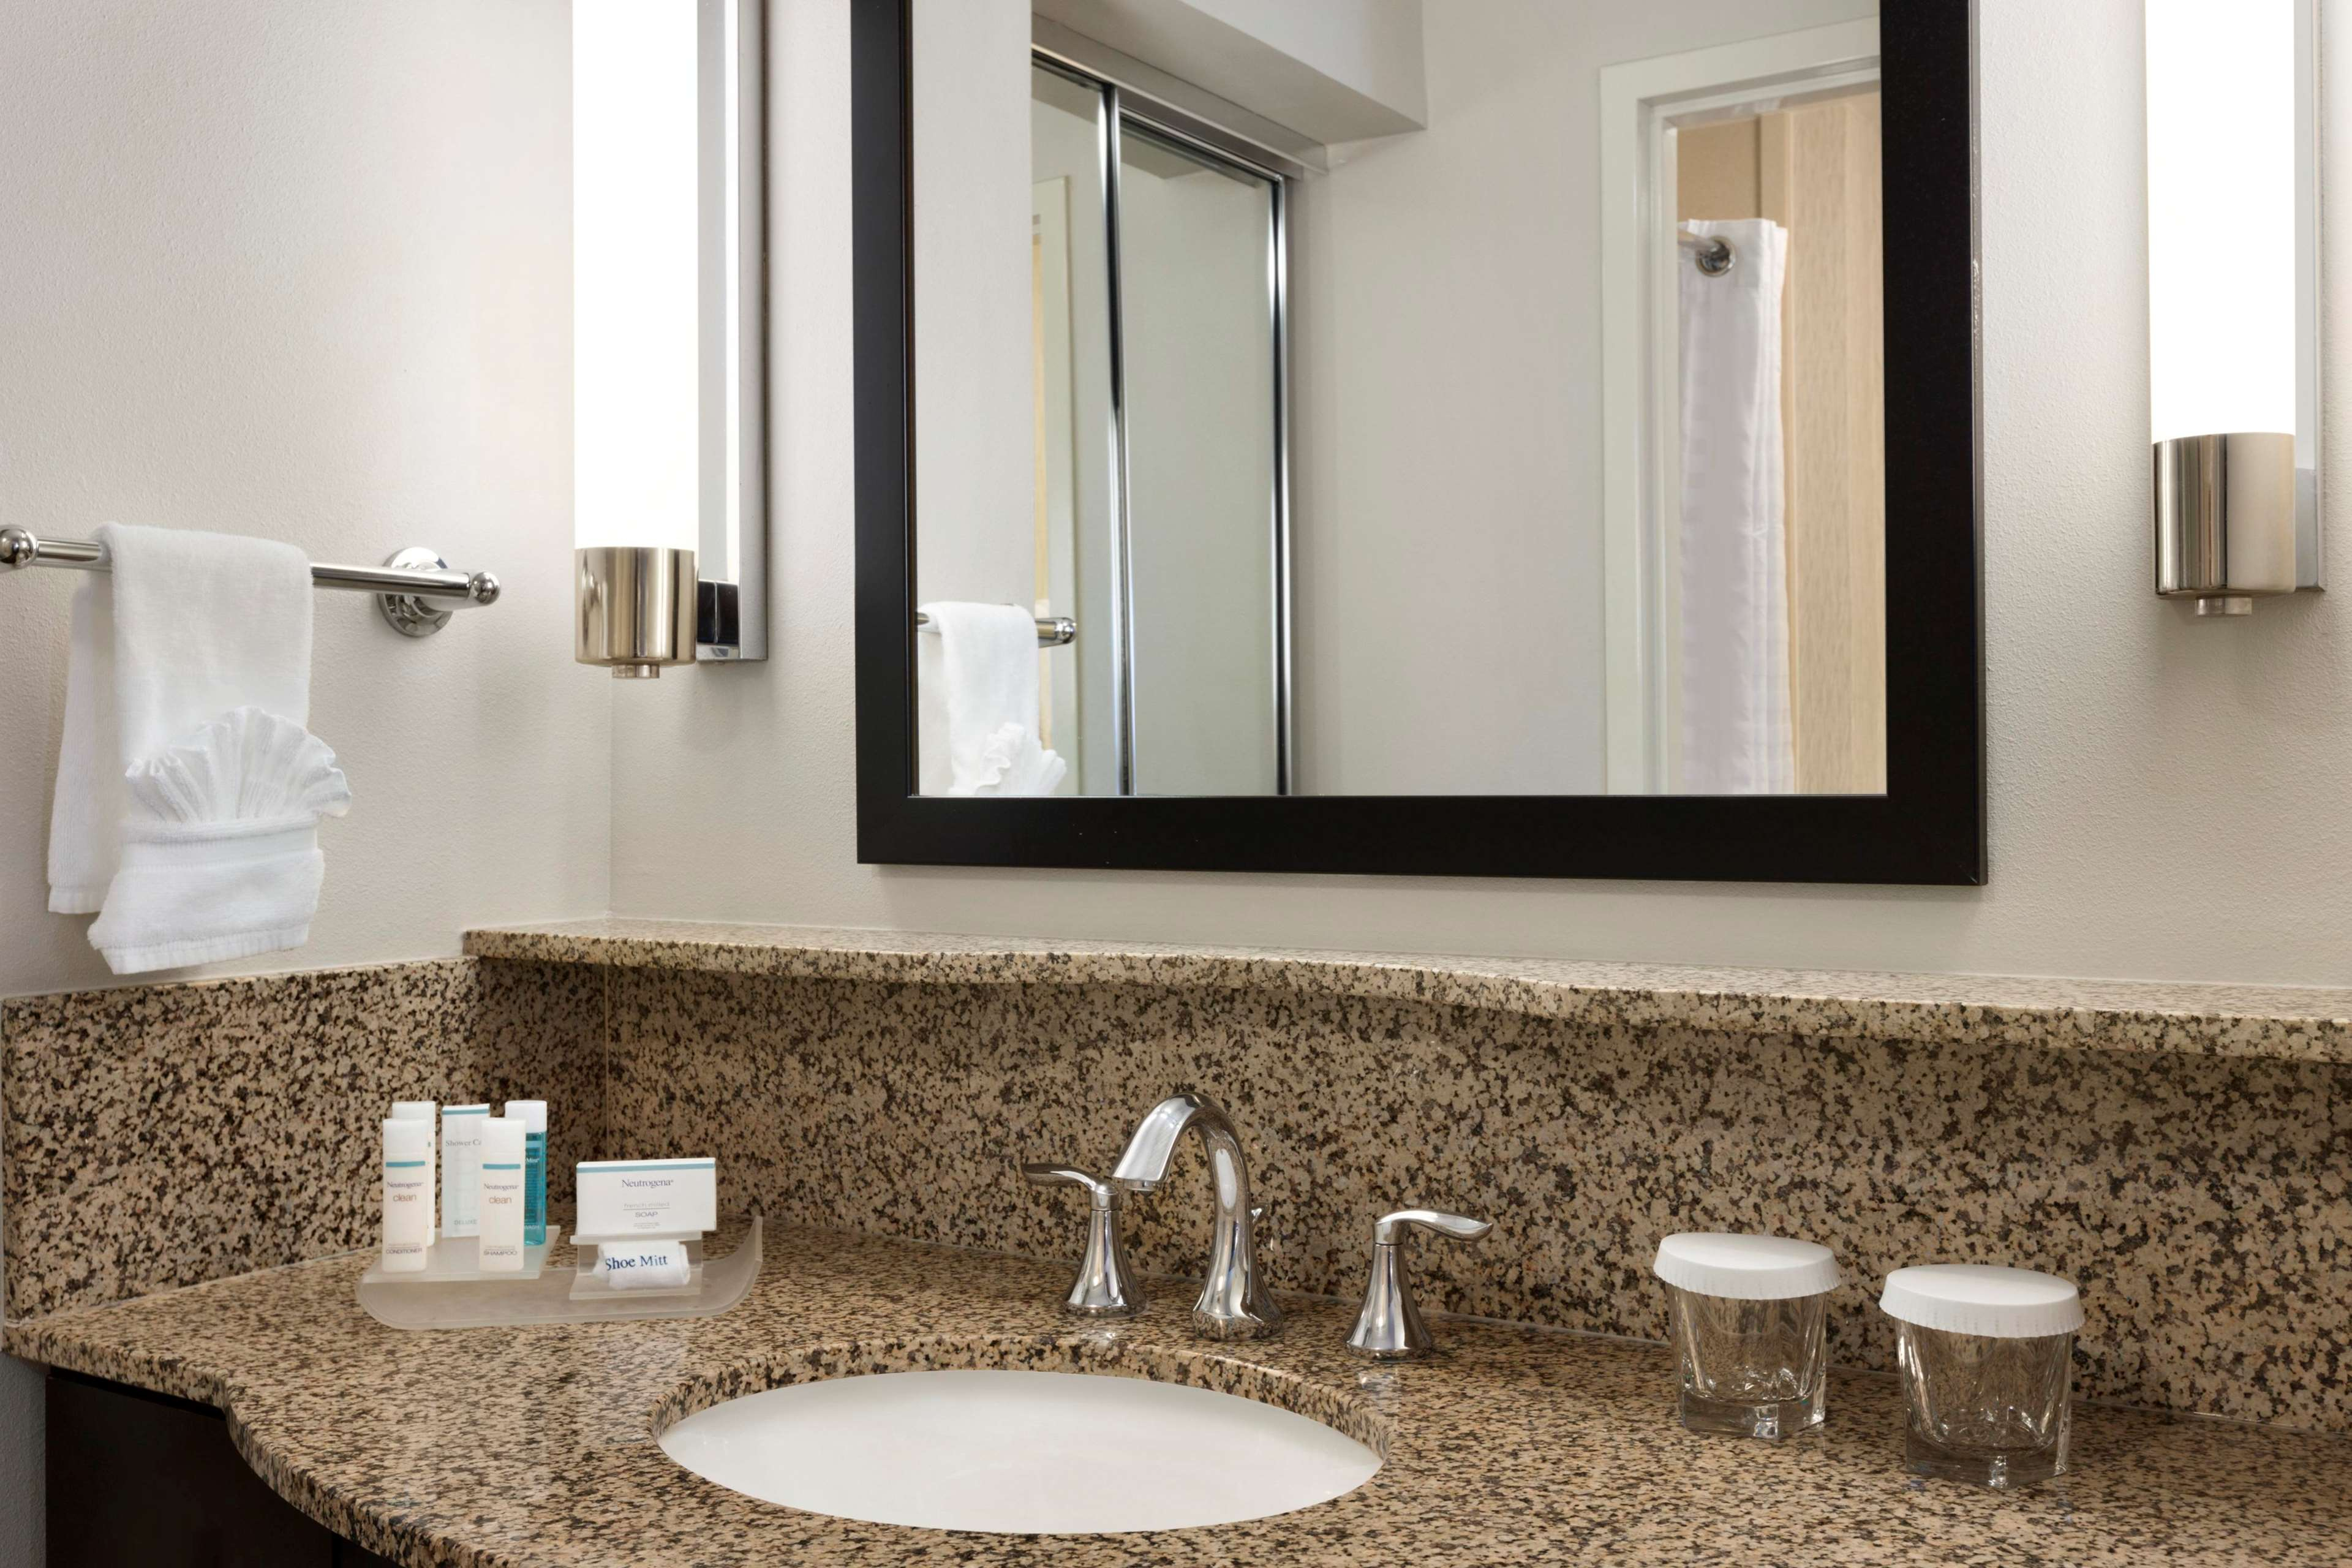 Homewood Suites by Hilton Plano-Richardson image 15